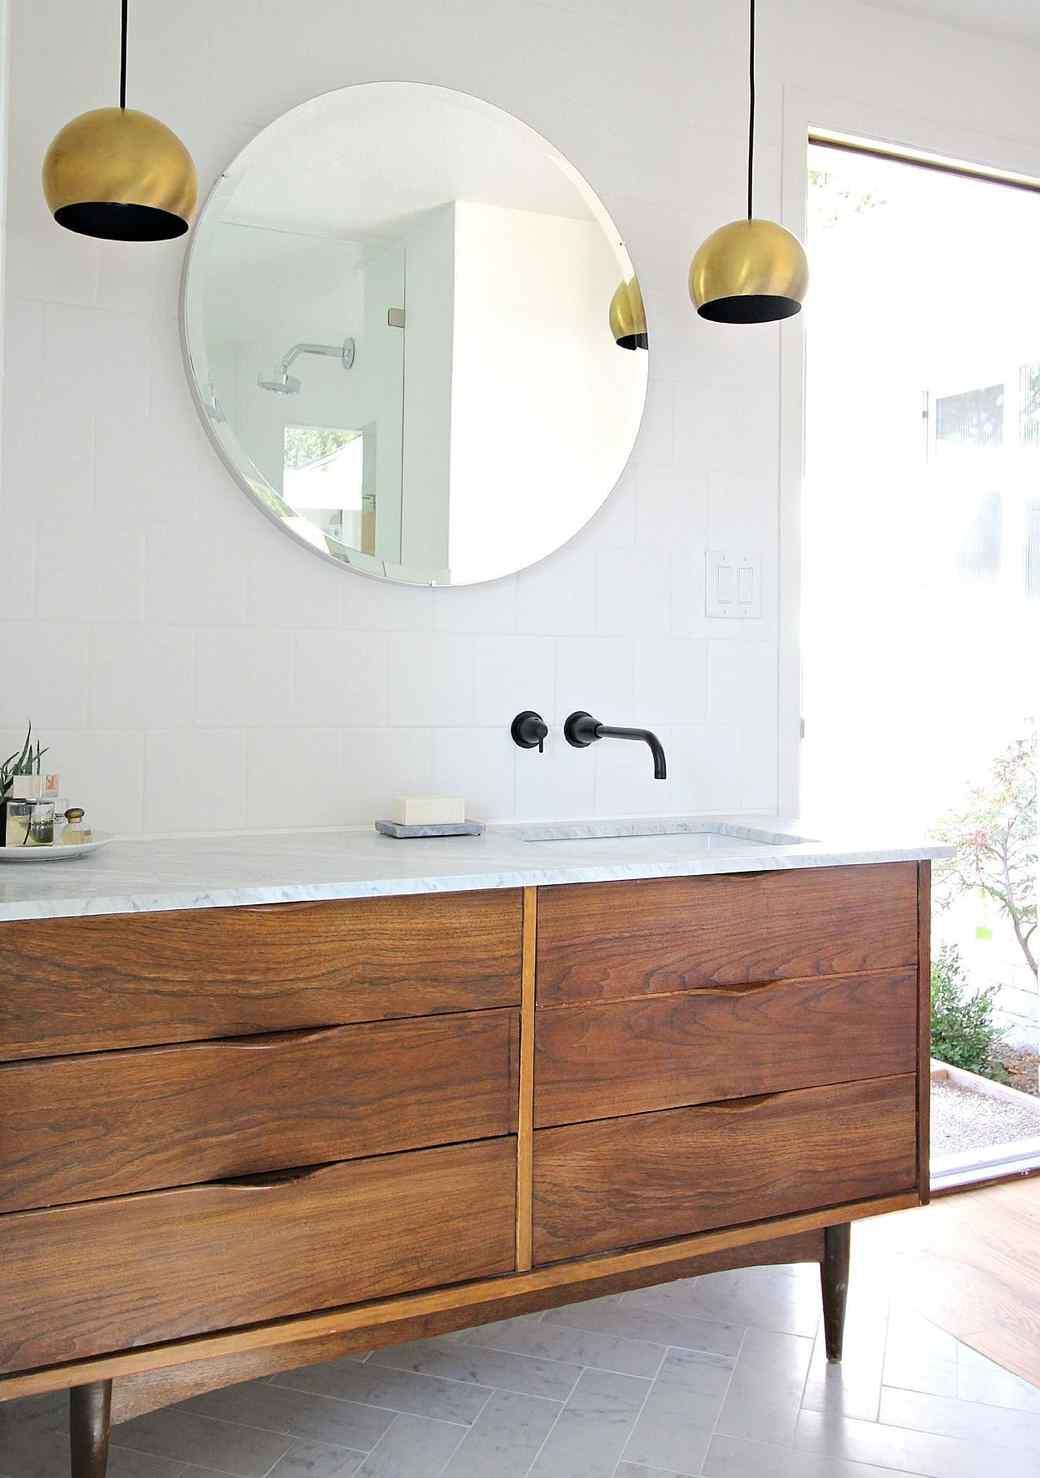 Bathroom-renovation.jpg (skyword:191432)